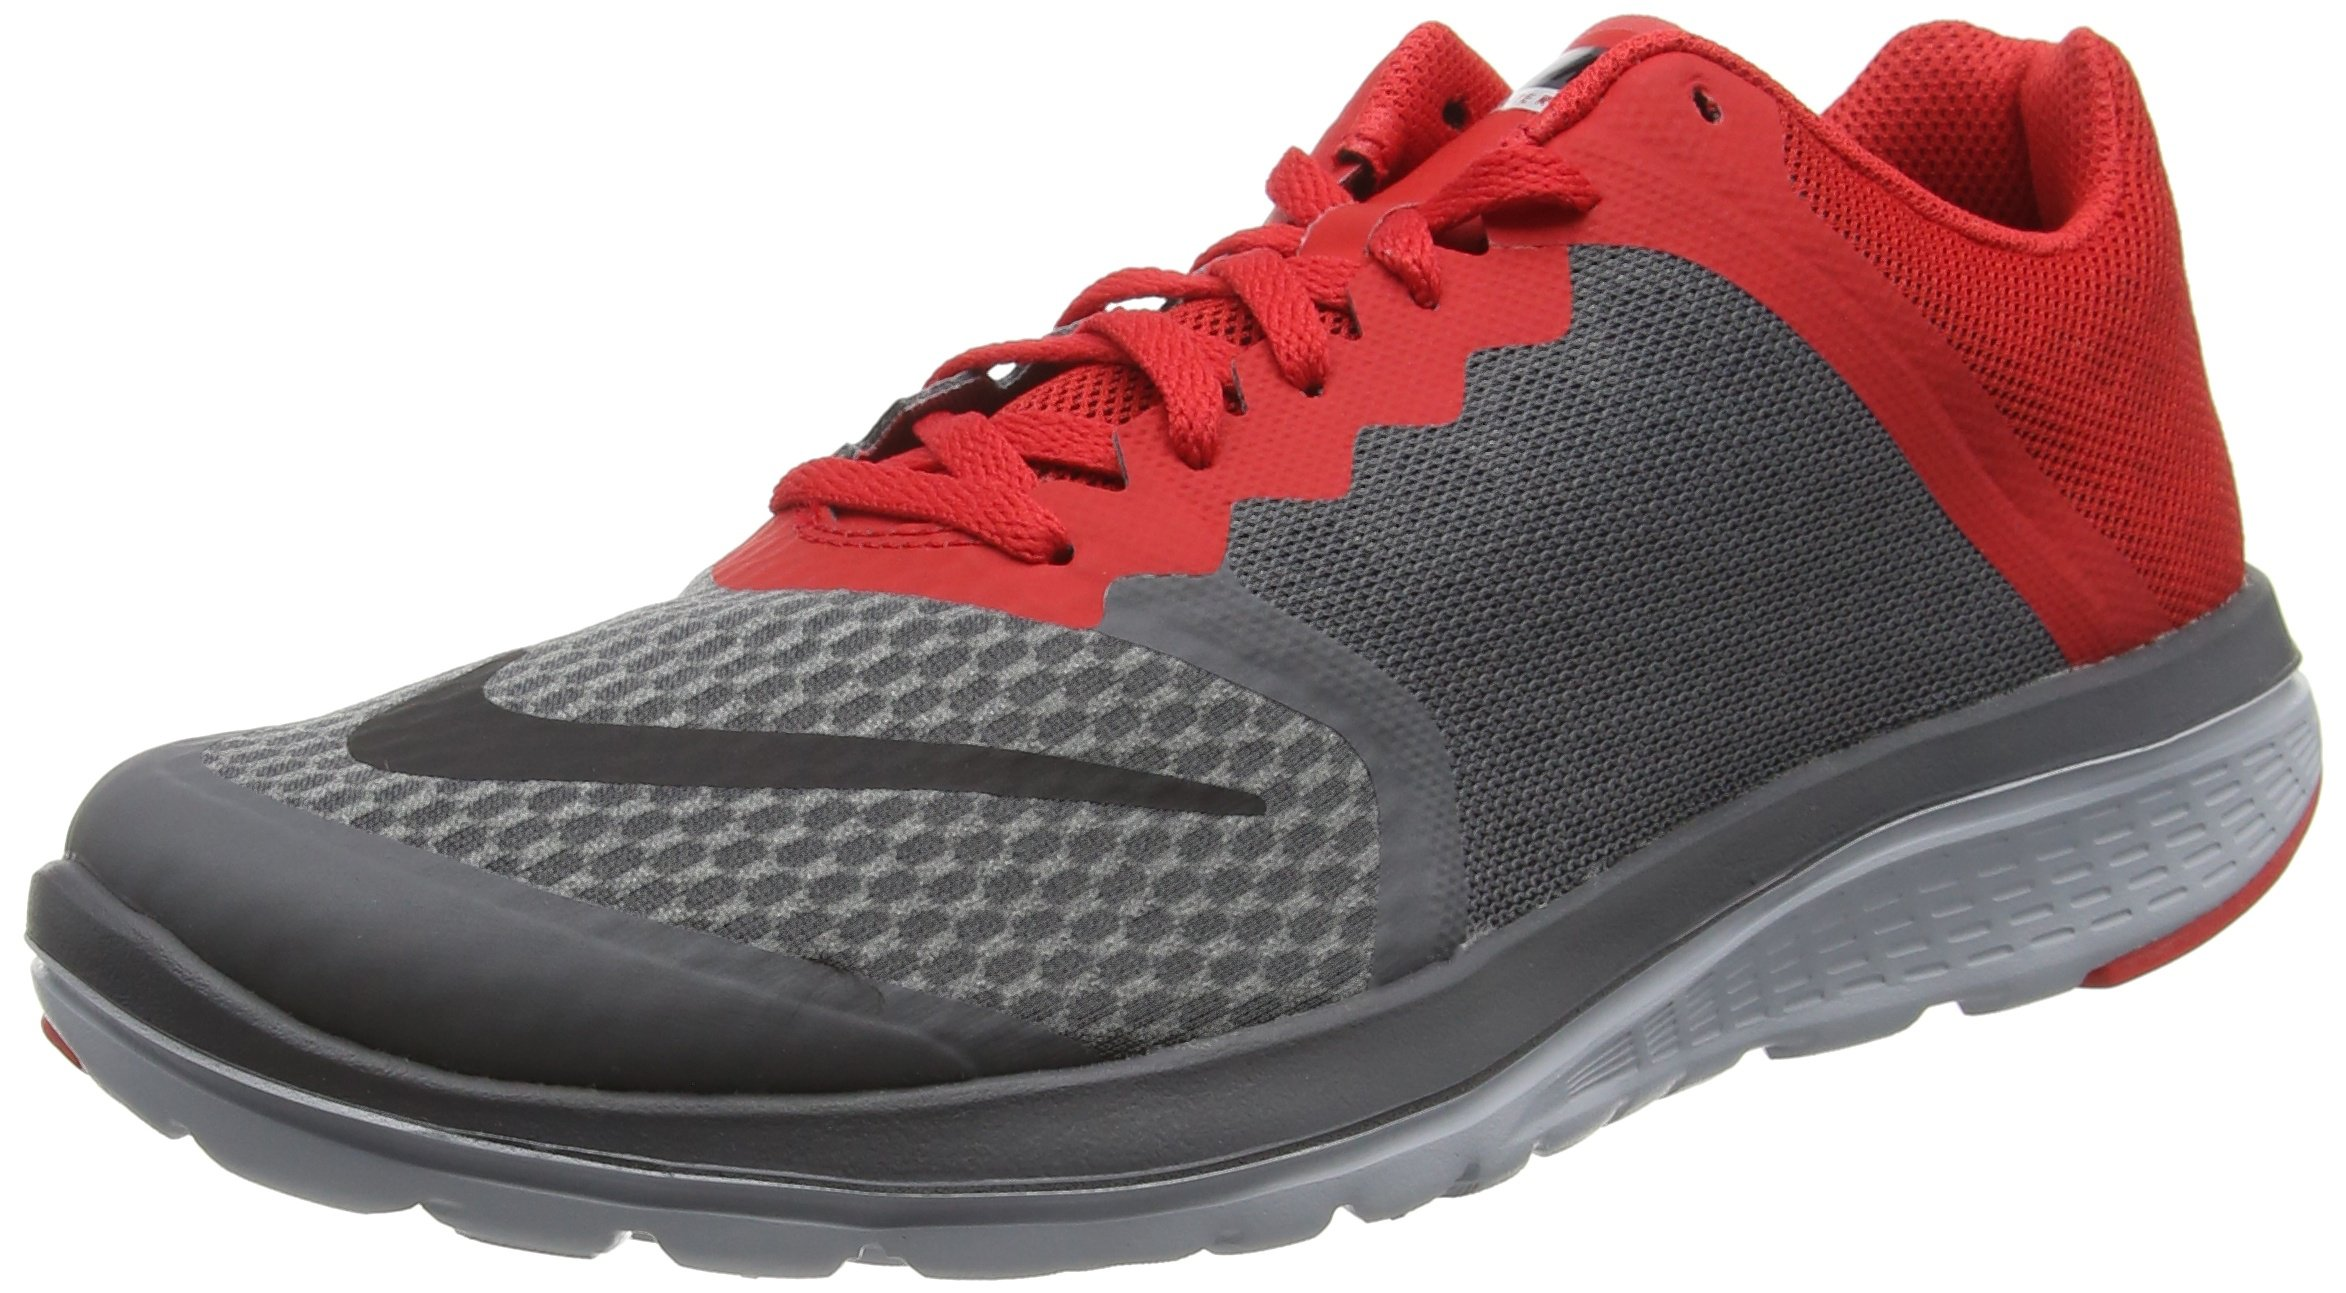 Nike Men's FS Lite Run 3 Drk Grey/Black/University Red/Wlf Gry, US Men's